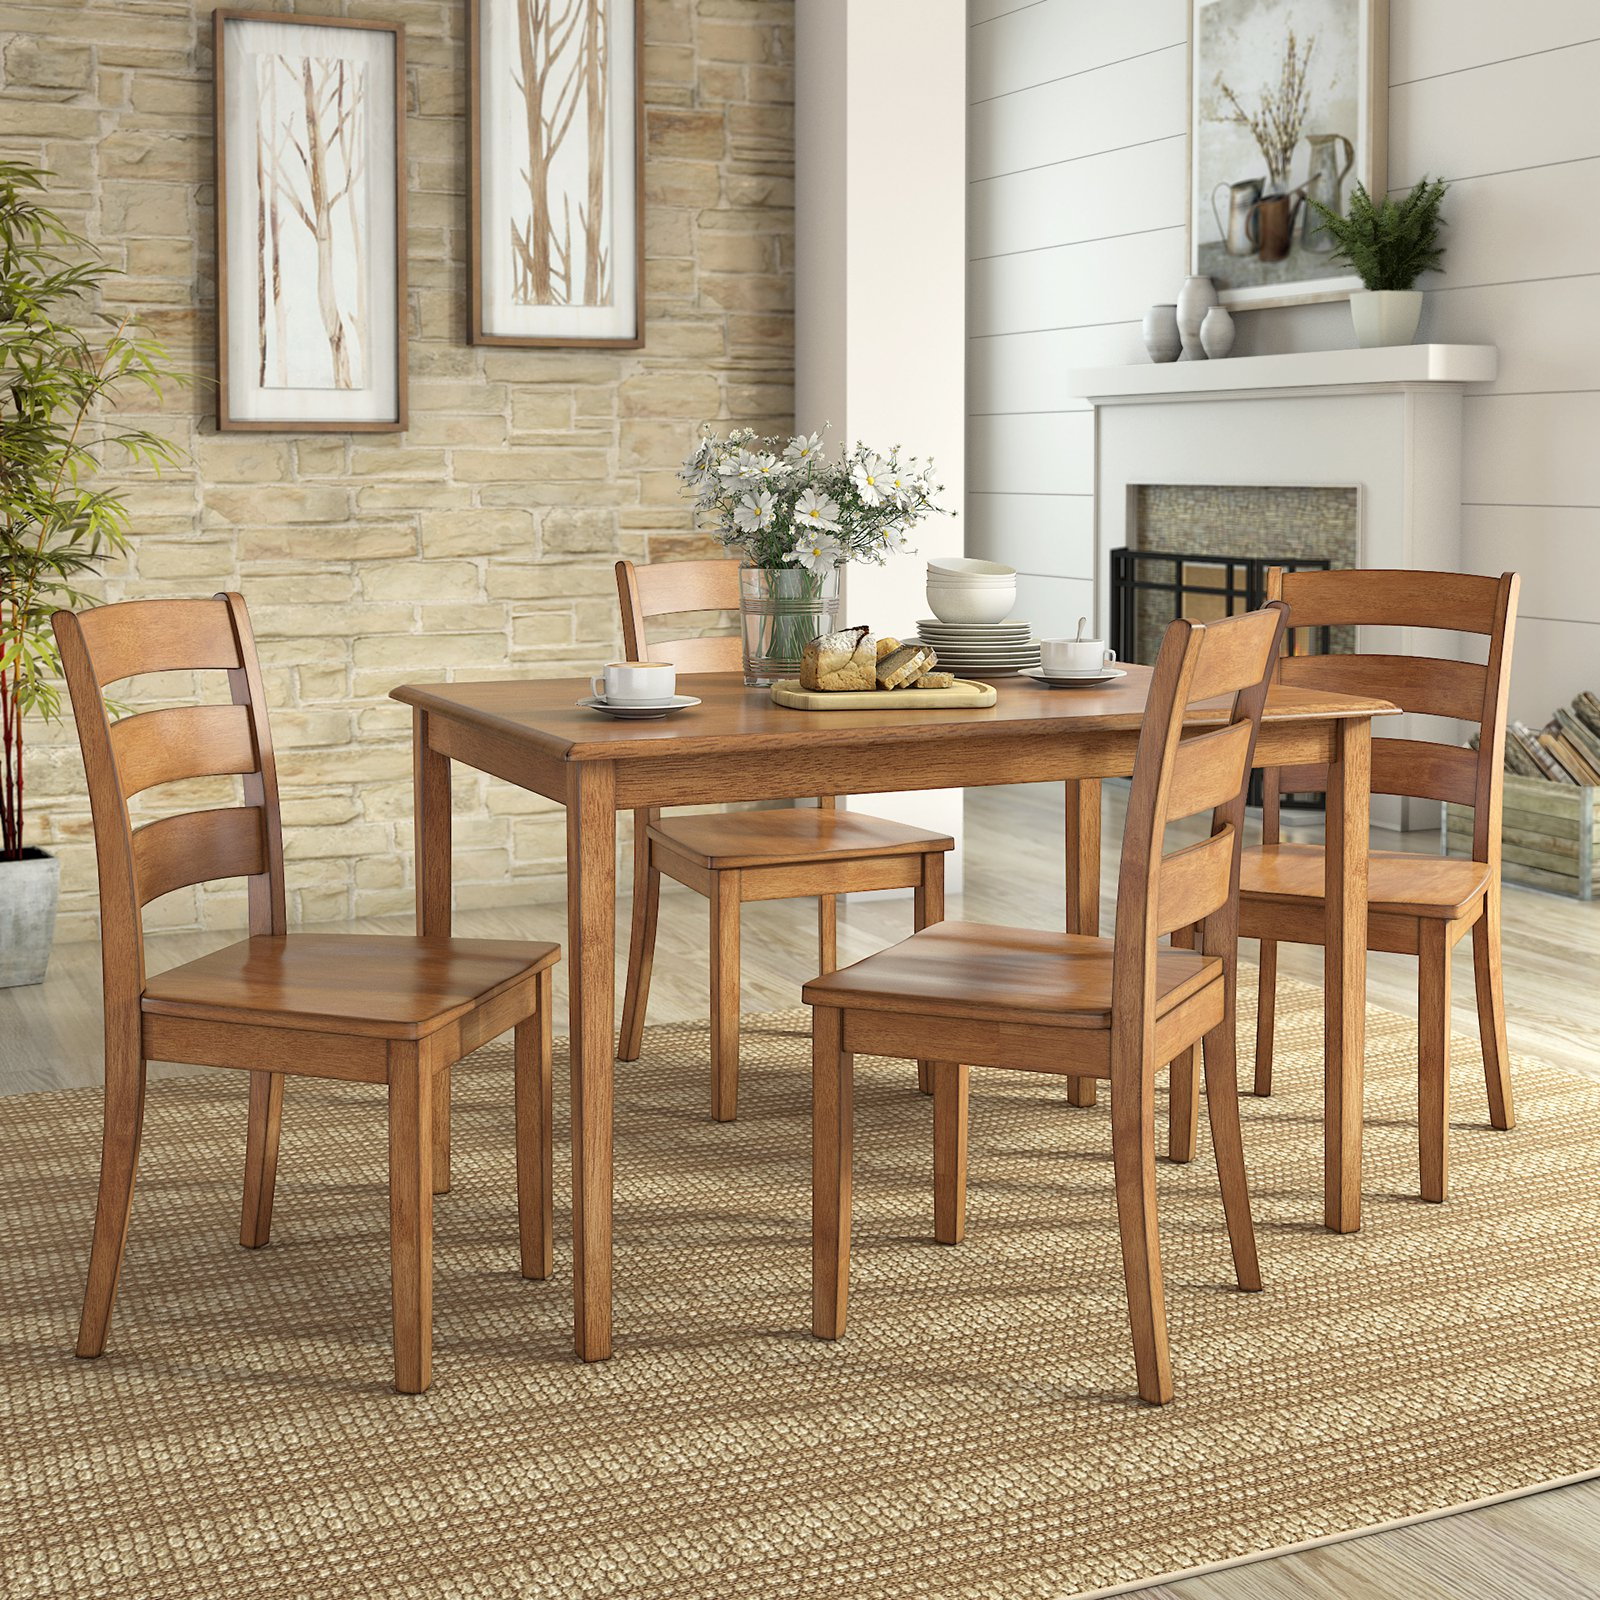 lexington dining chairs plastic cafe johannesburg weston home 5 piece set 4 ladder back walmart com